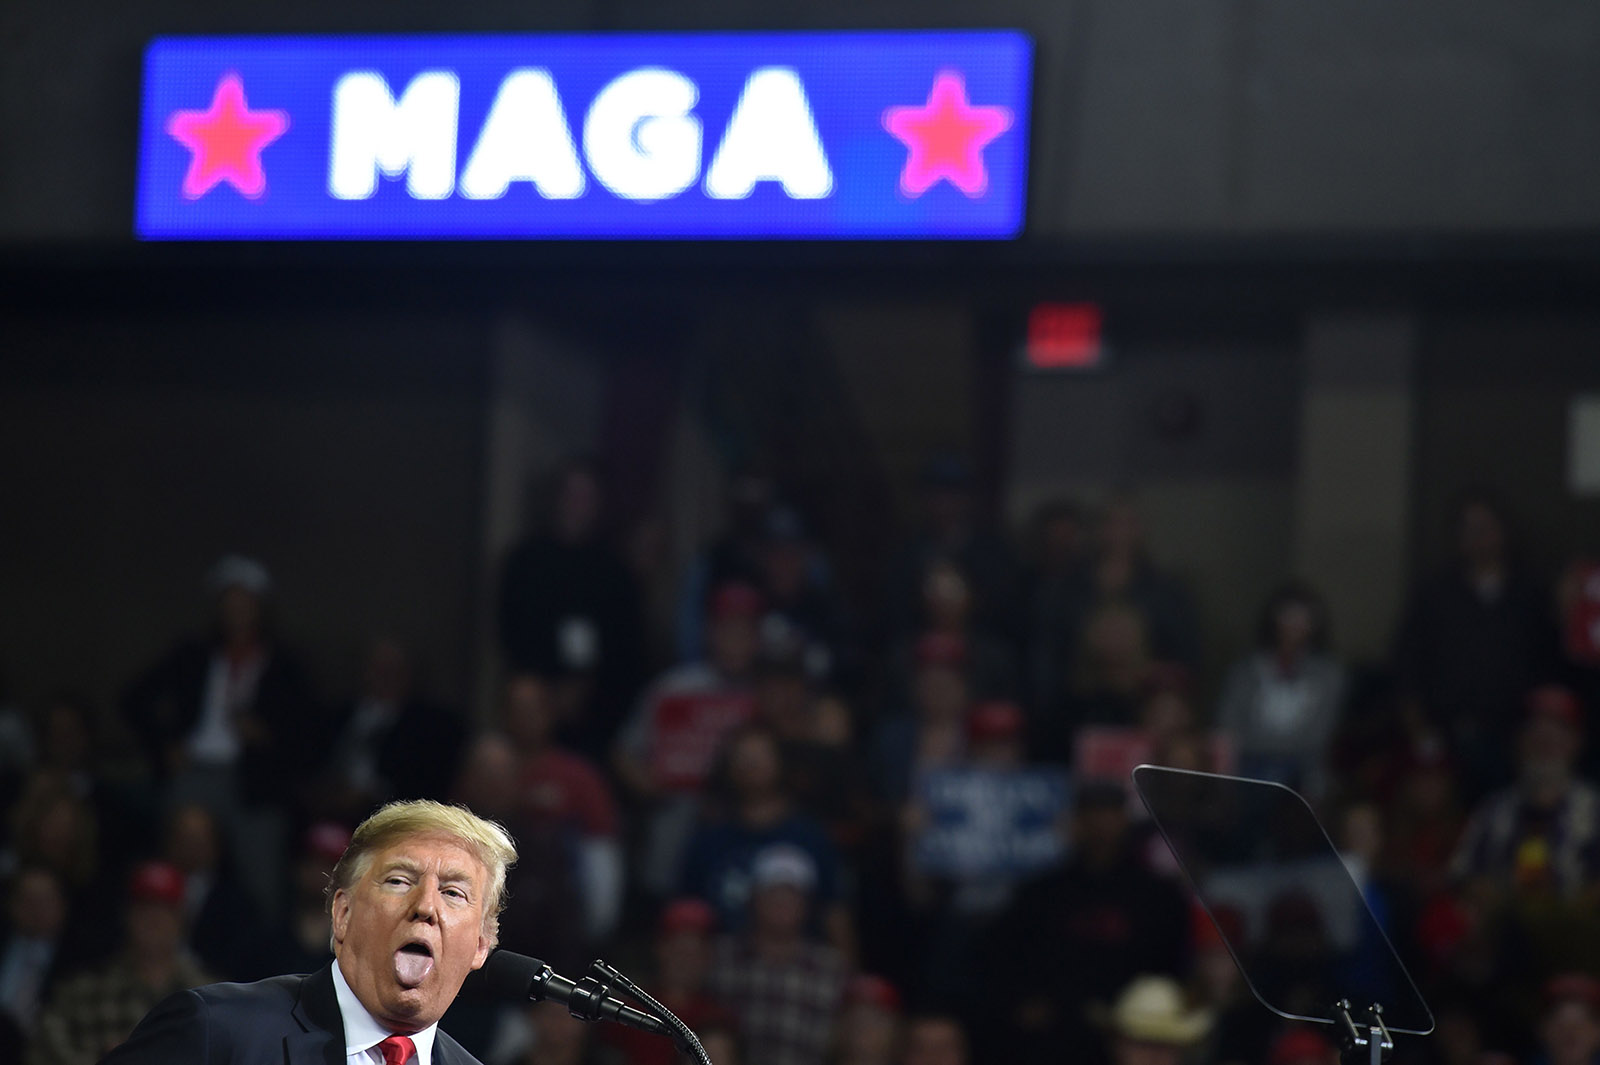 President Trump addressing a rally in Topeka, Kansas, October 6, 2018